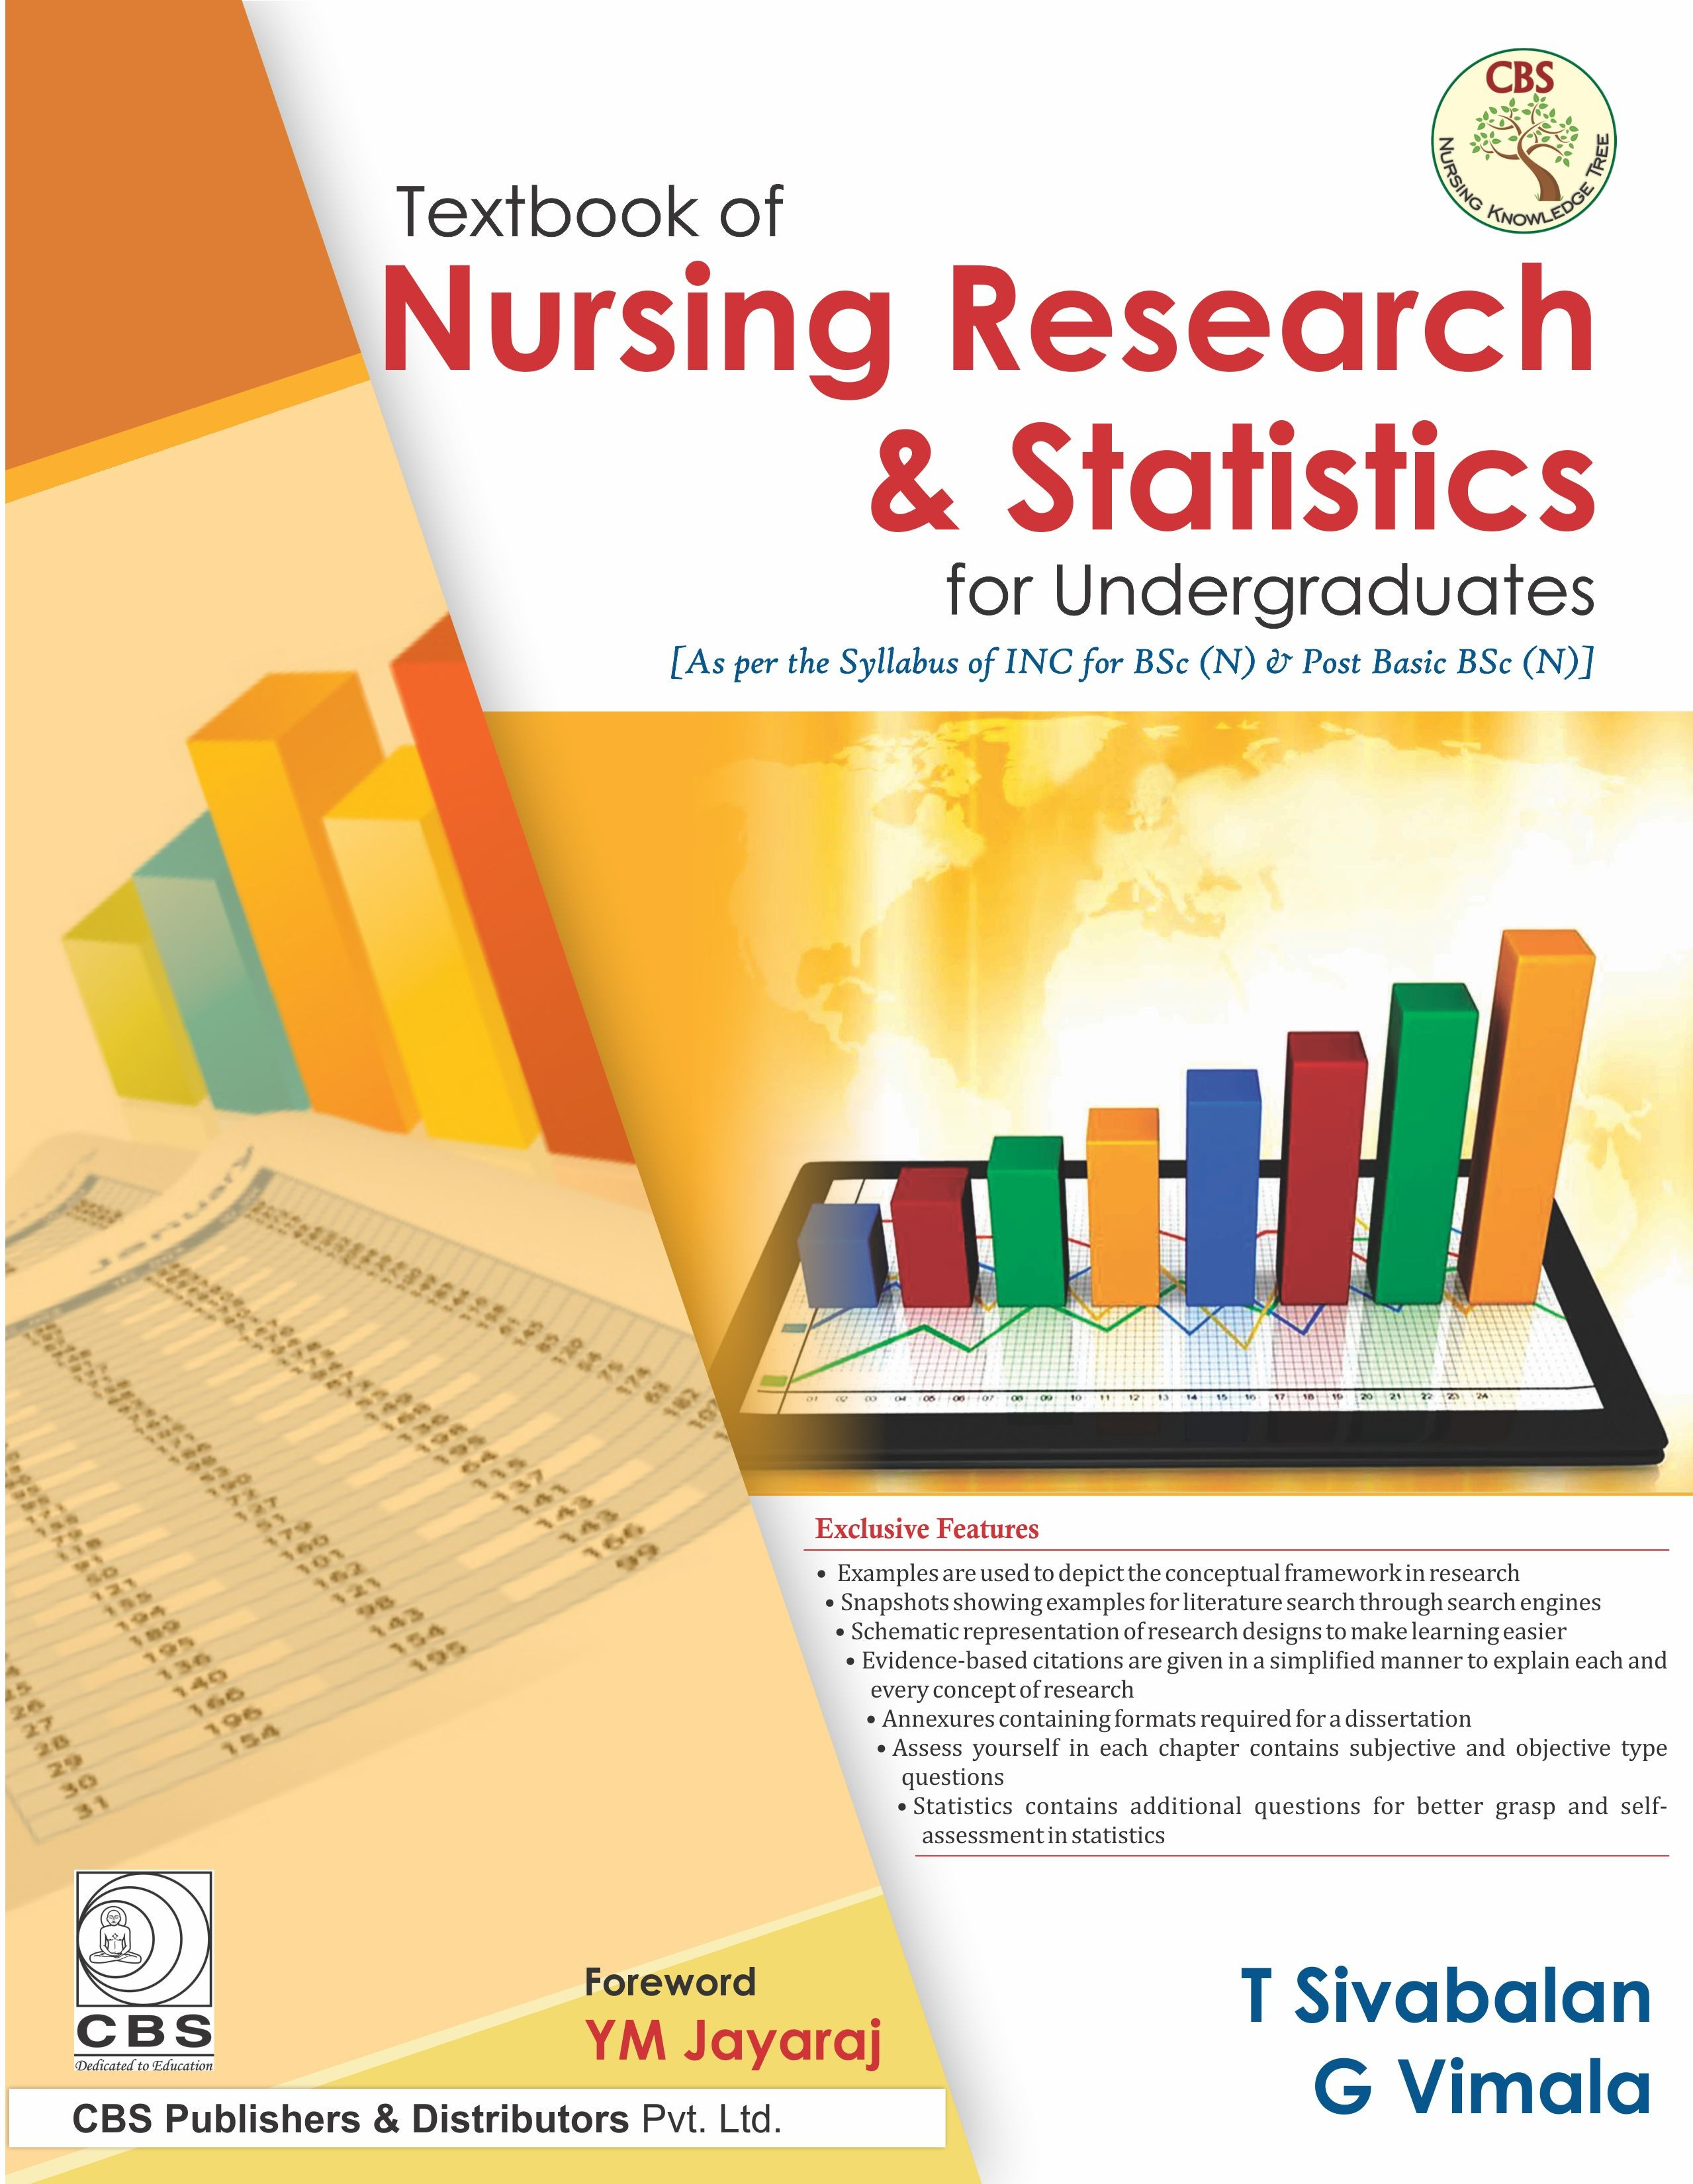 Textbook of Nursing Research & Statistics for Undergraduate